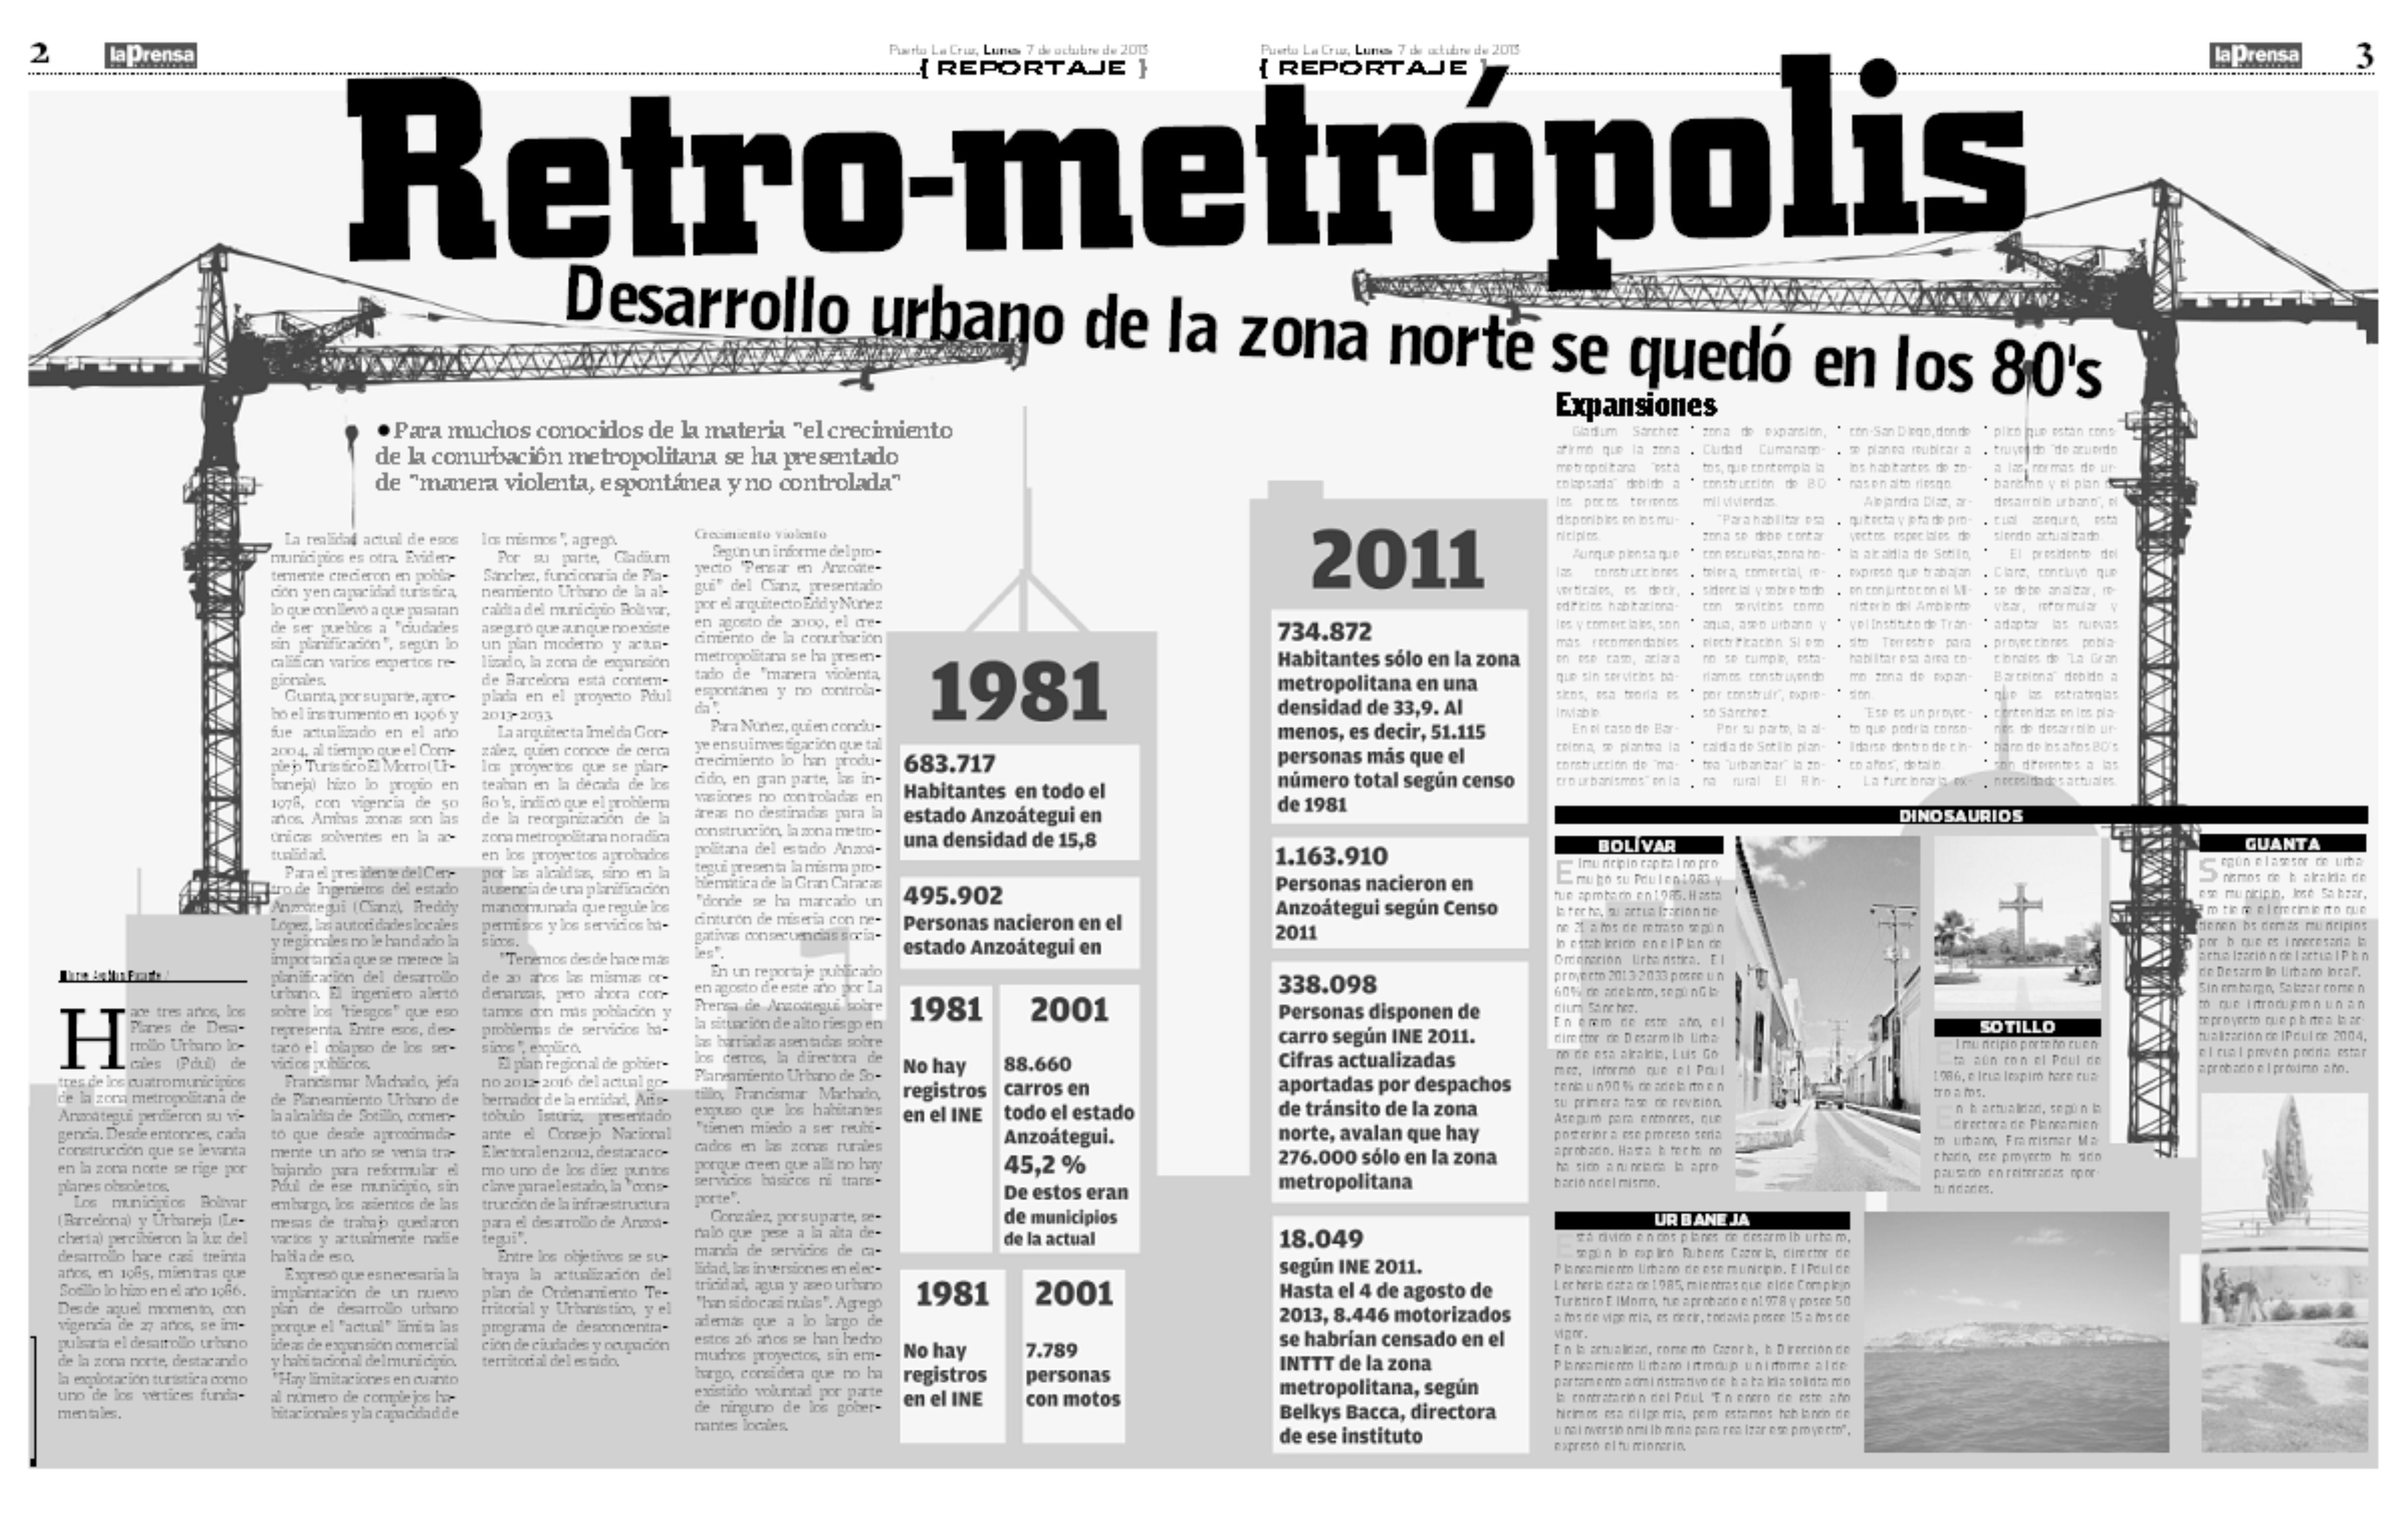 Retrometrópolis (Reportaje La Prensa de Anzoátegui: 17-10-2013